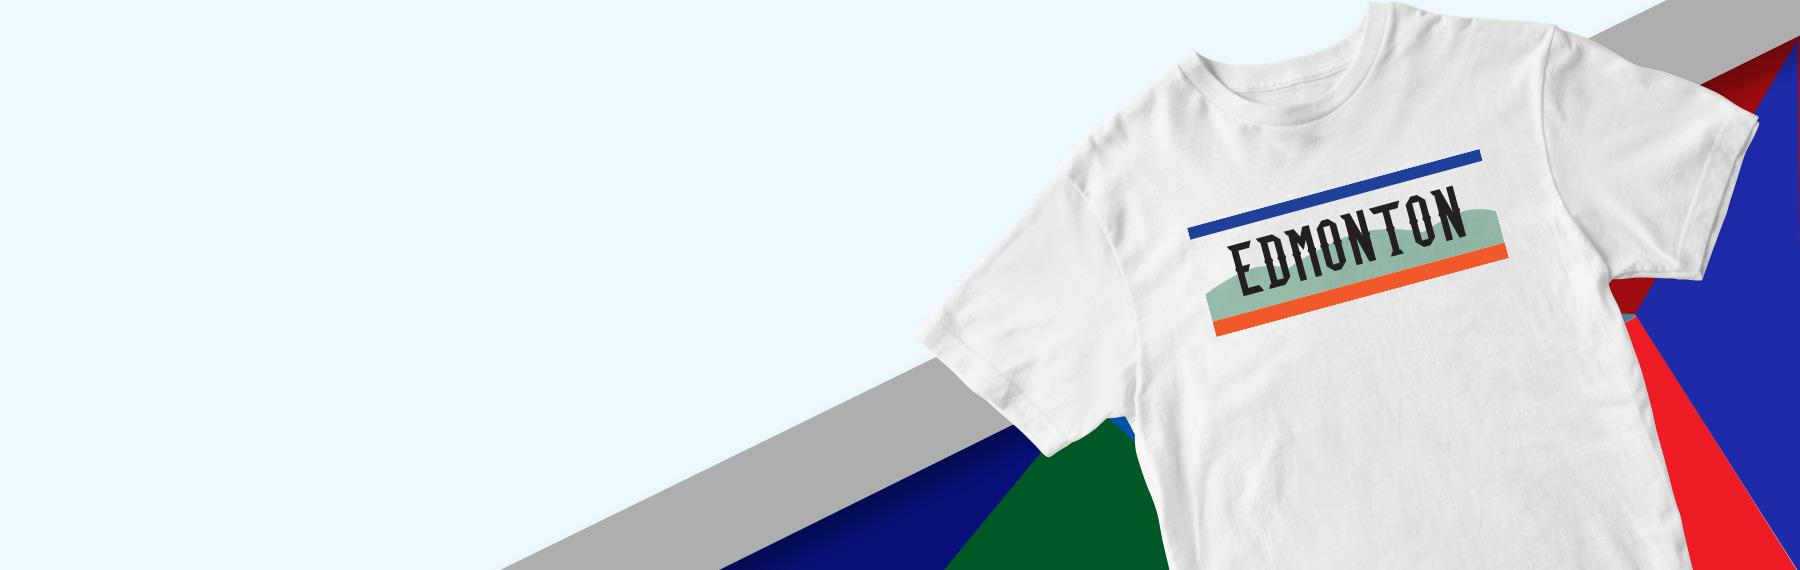 fbe8a4e3 Order Custom T-Shirts in Edmonton | T-Shirt Elephant